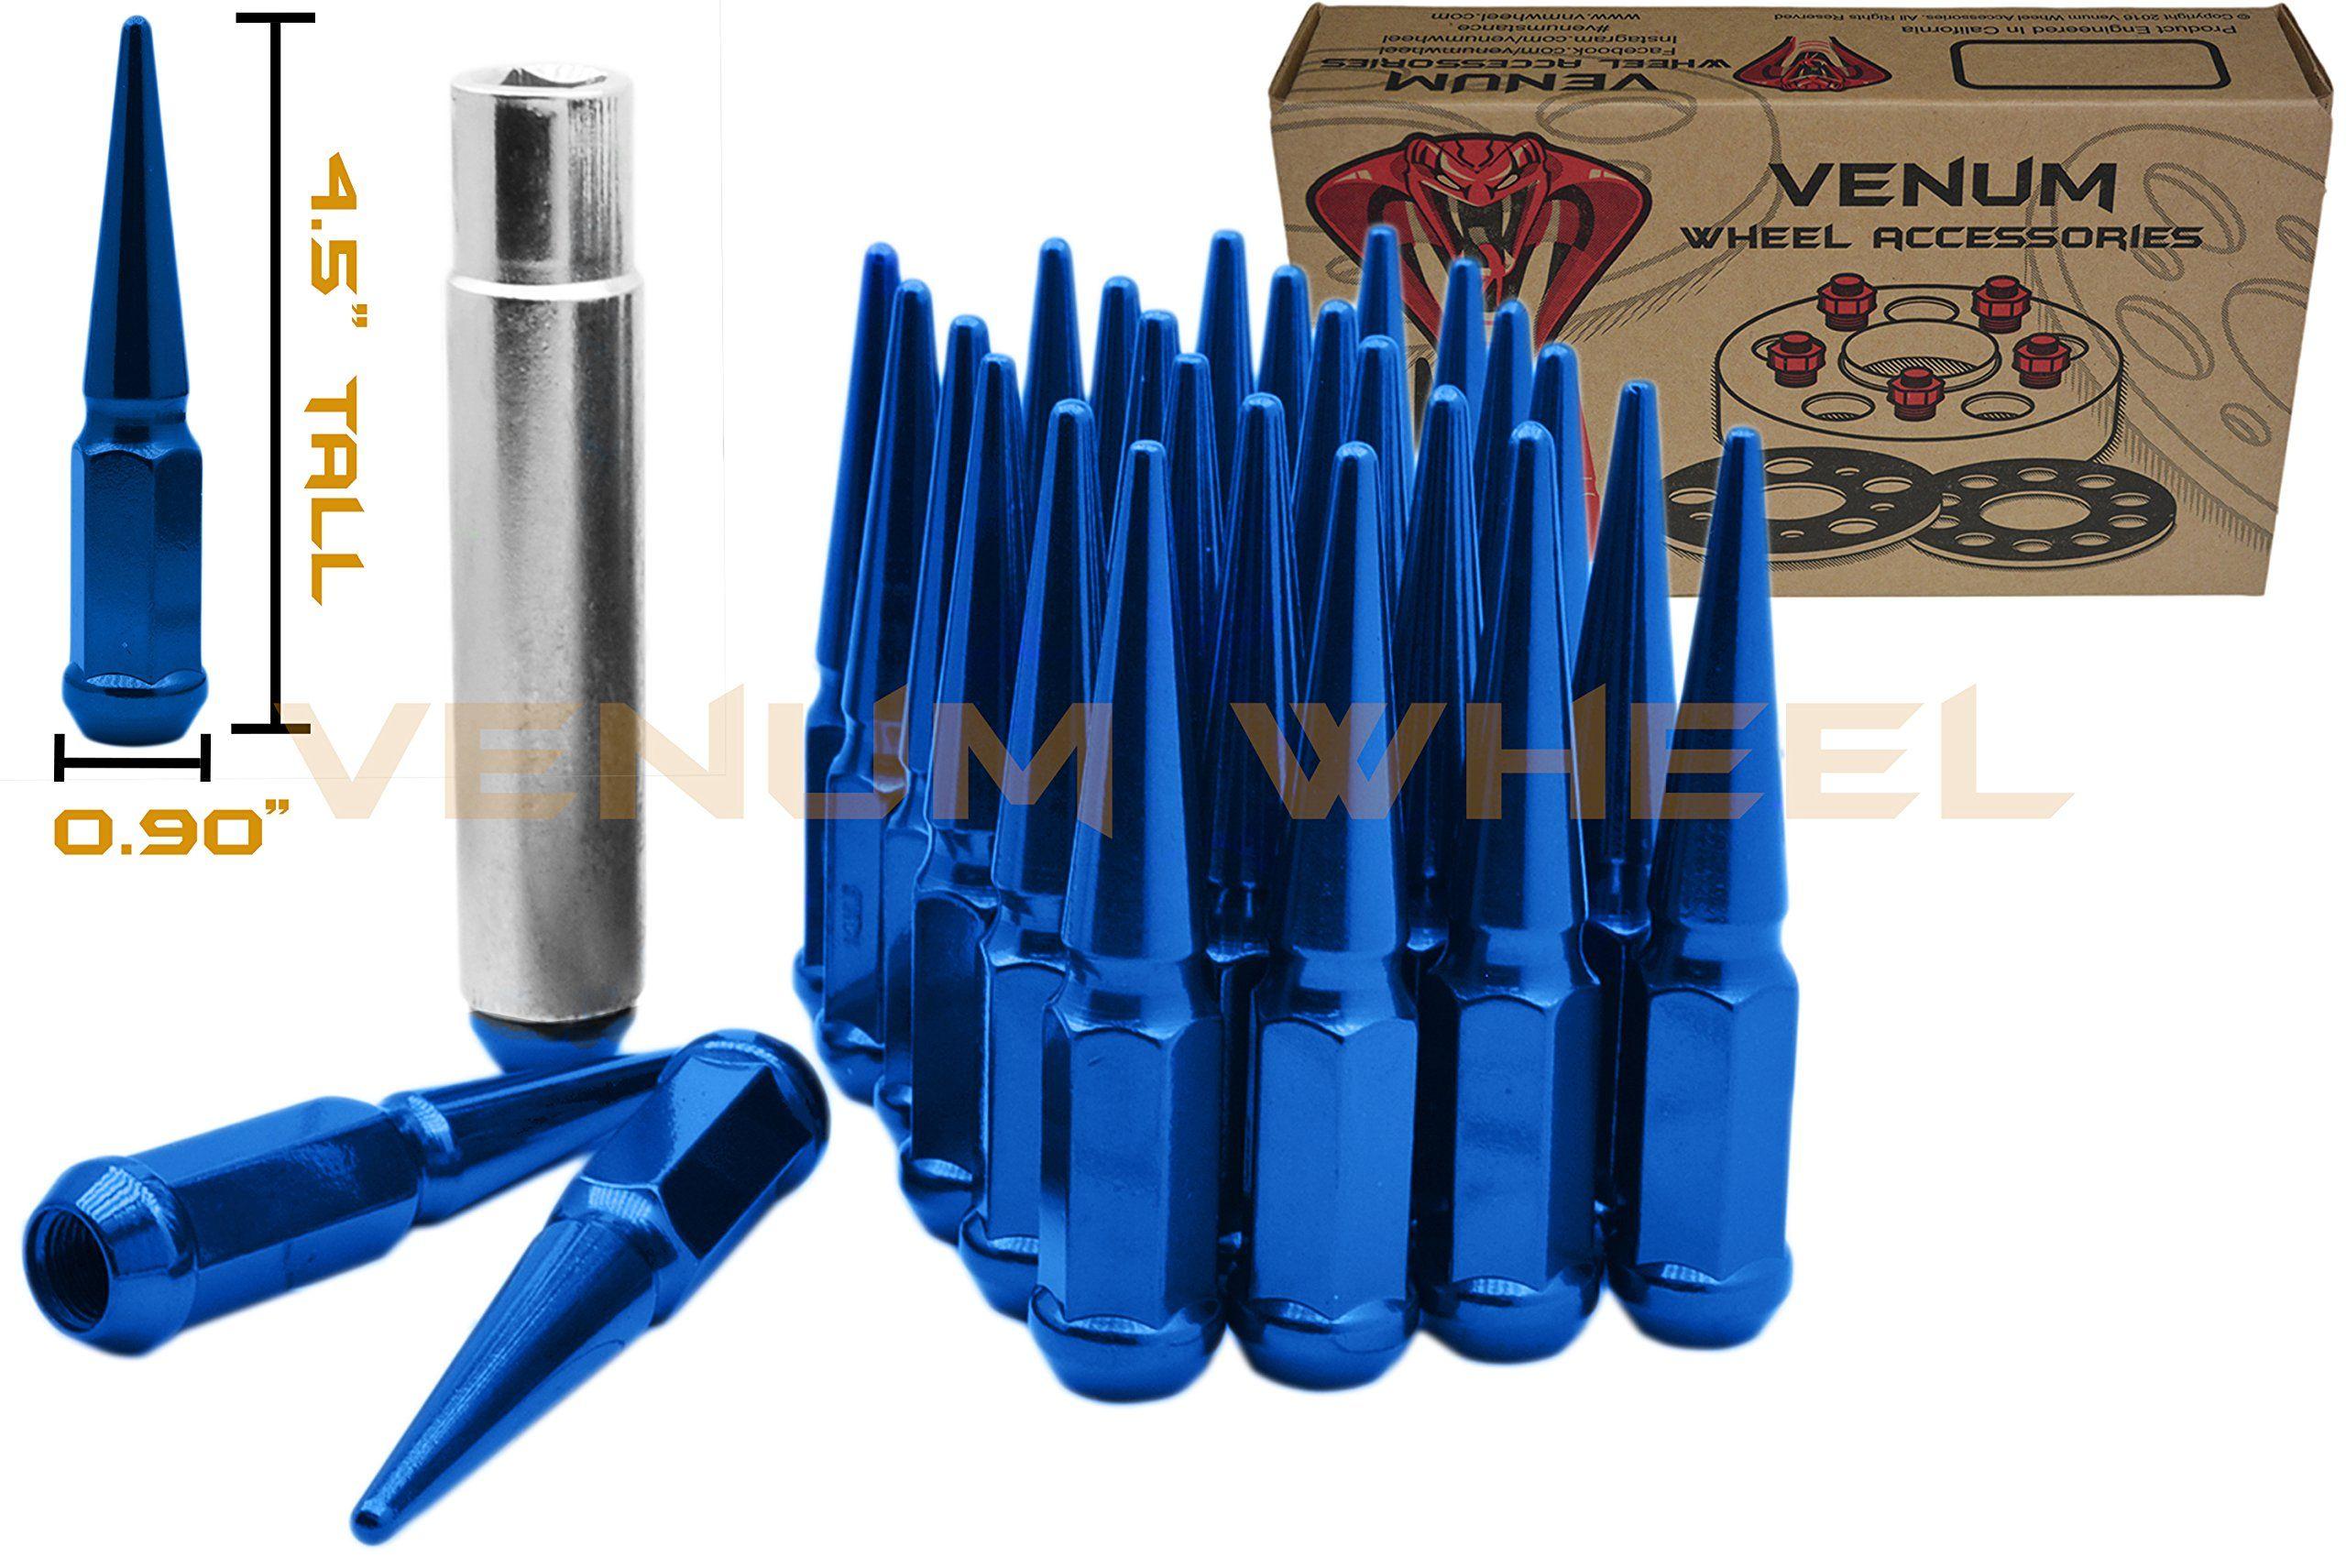 2 KEYS12X1.5FITS MOST HONDA ACURA 16 BLUE SPLINE TUNER RACING LUG NUTS